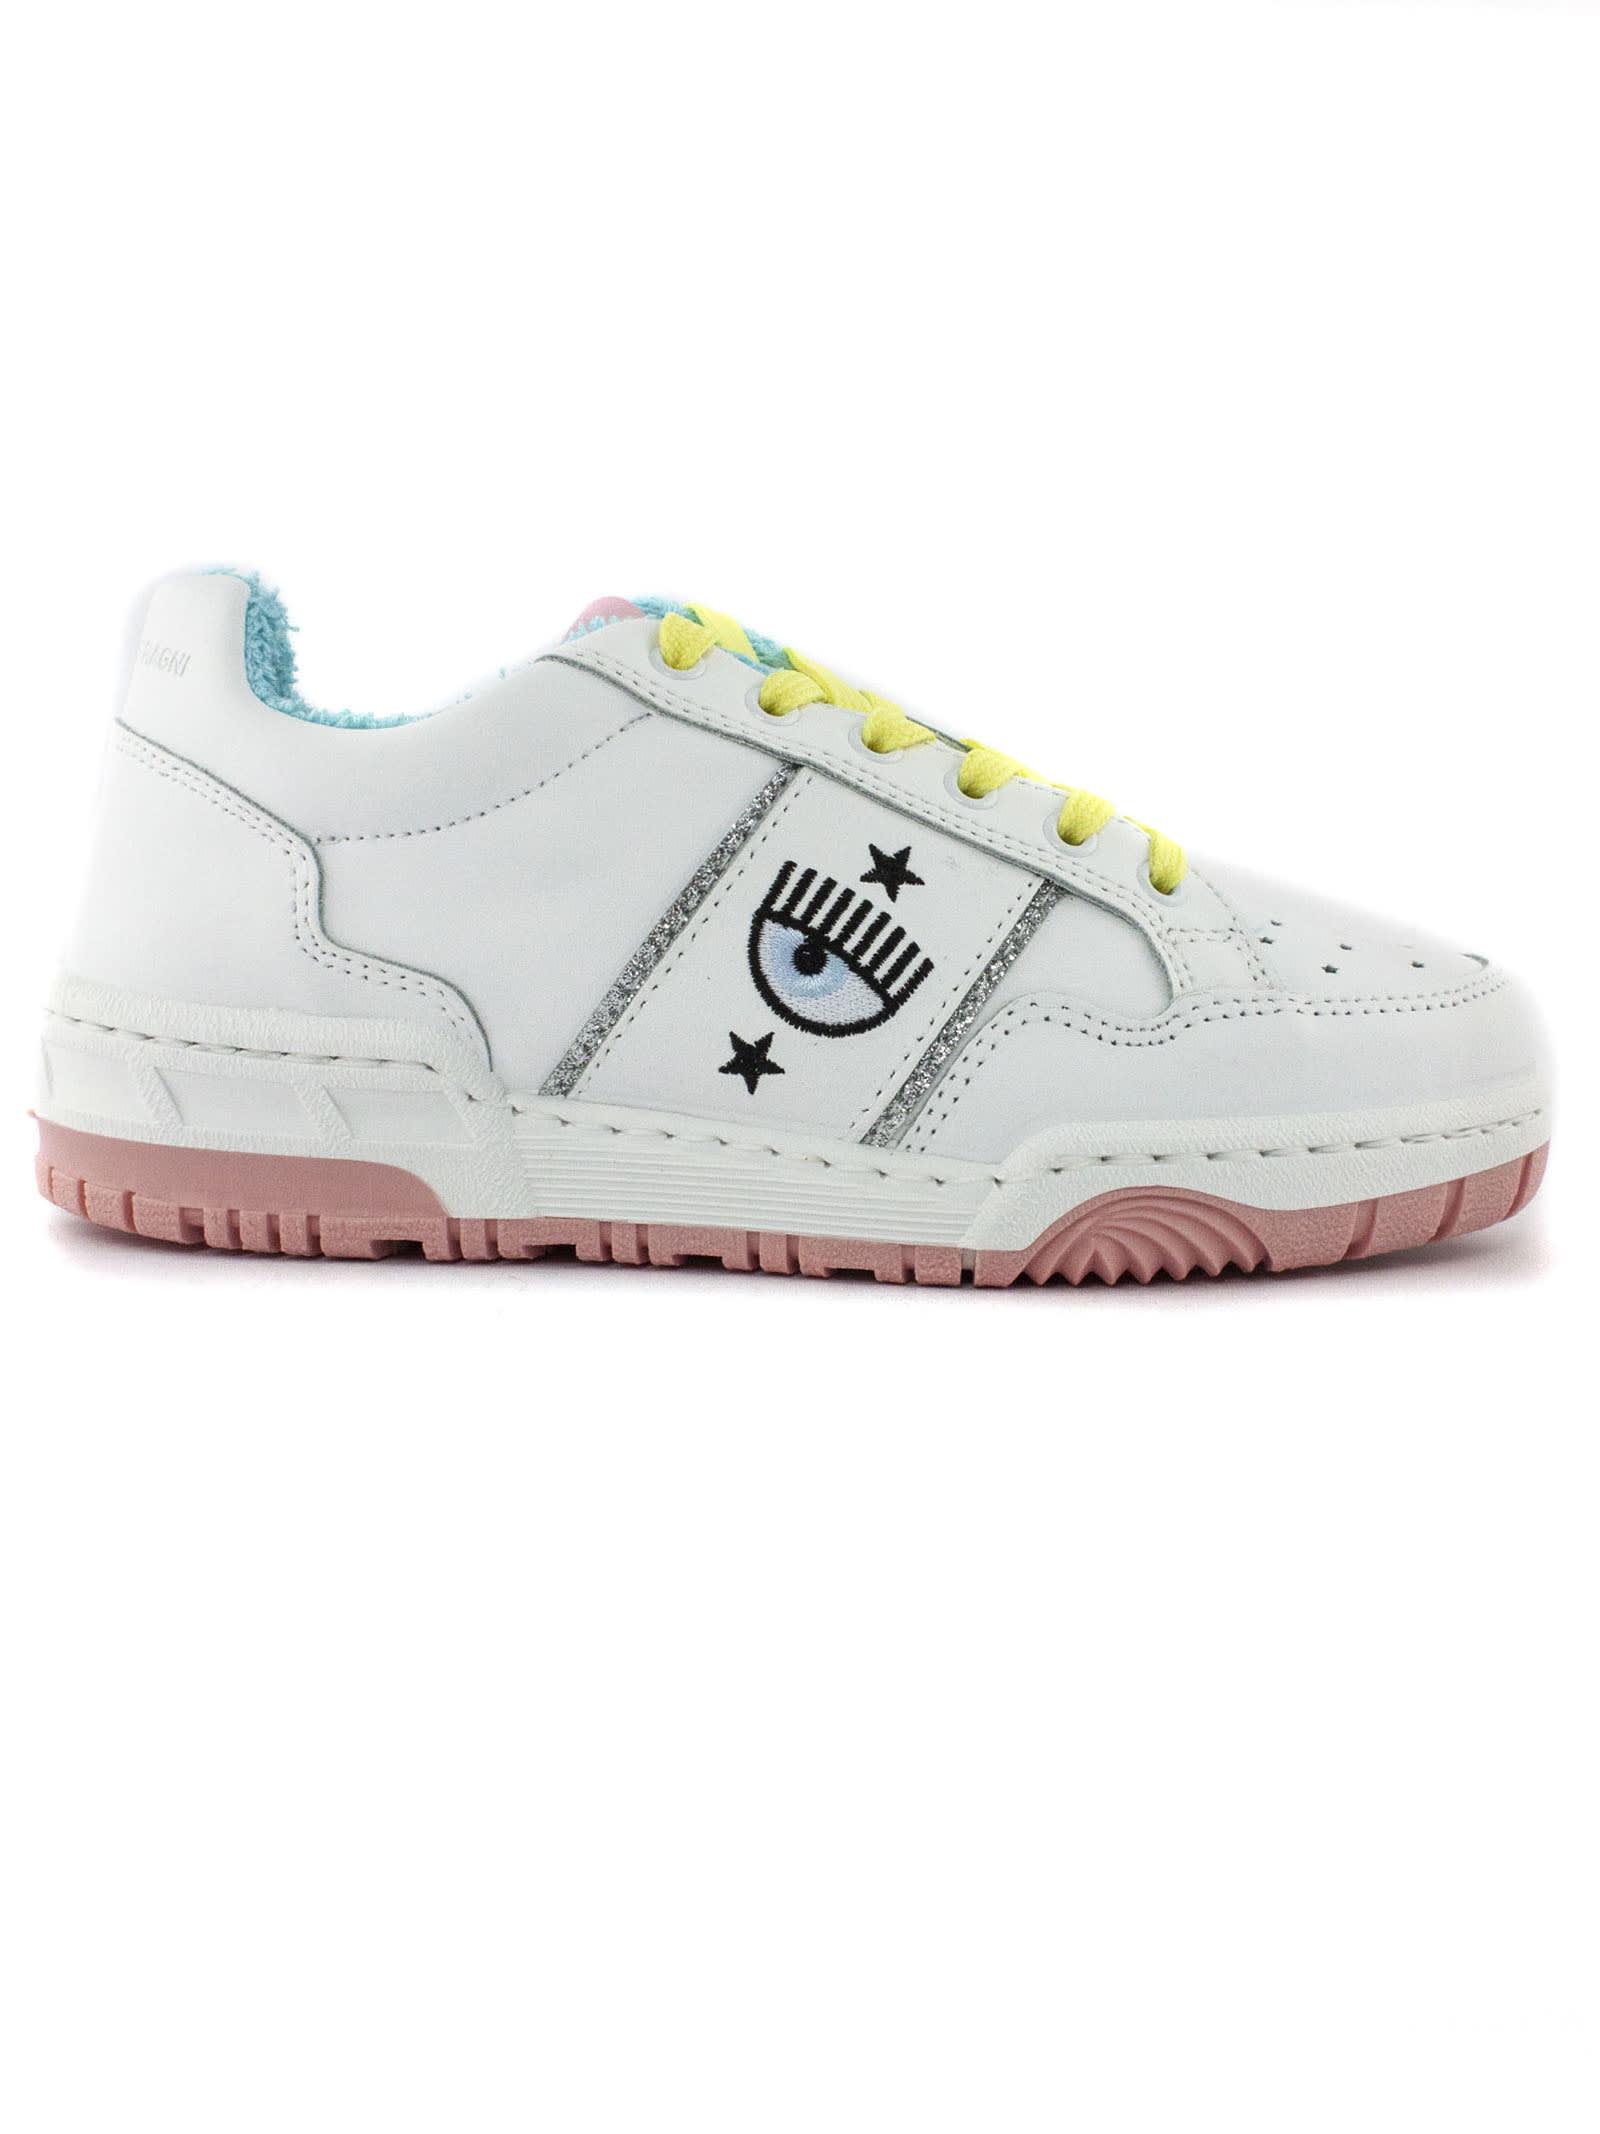 Chiara Ferragni Sneakers WHITE LEATHER CF1 SNEAKERS